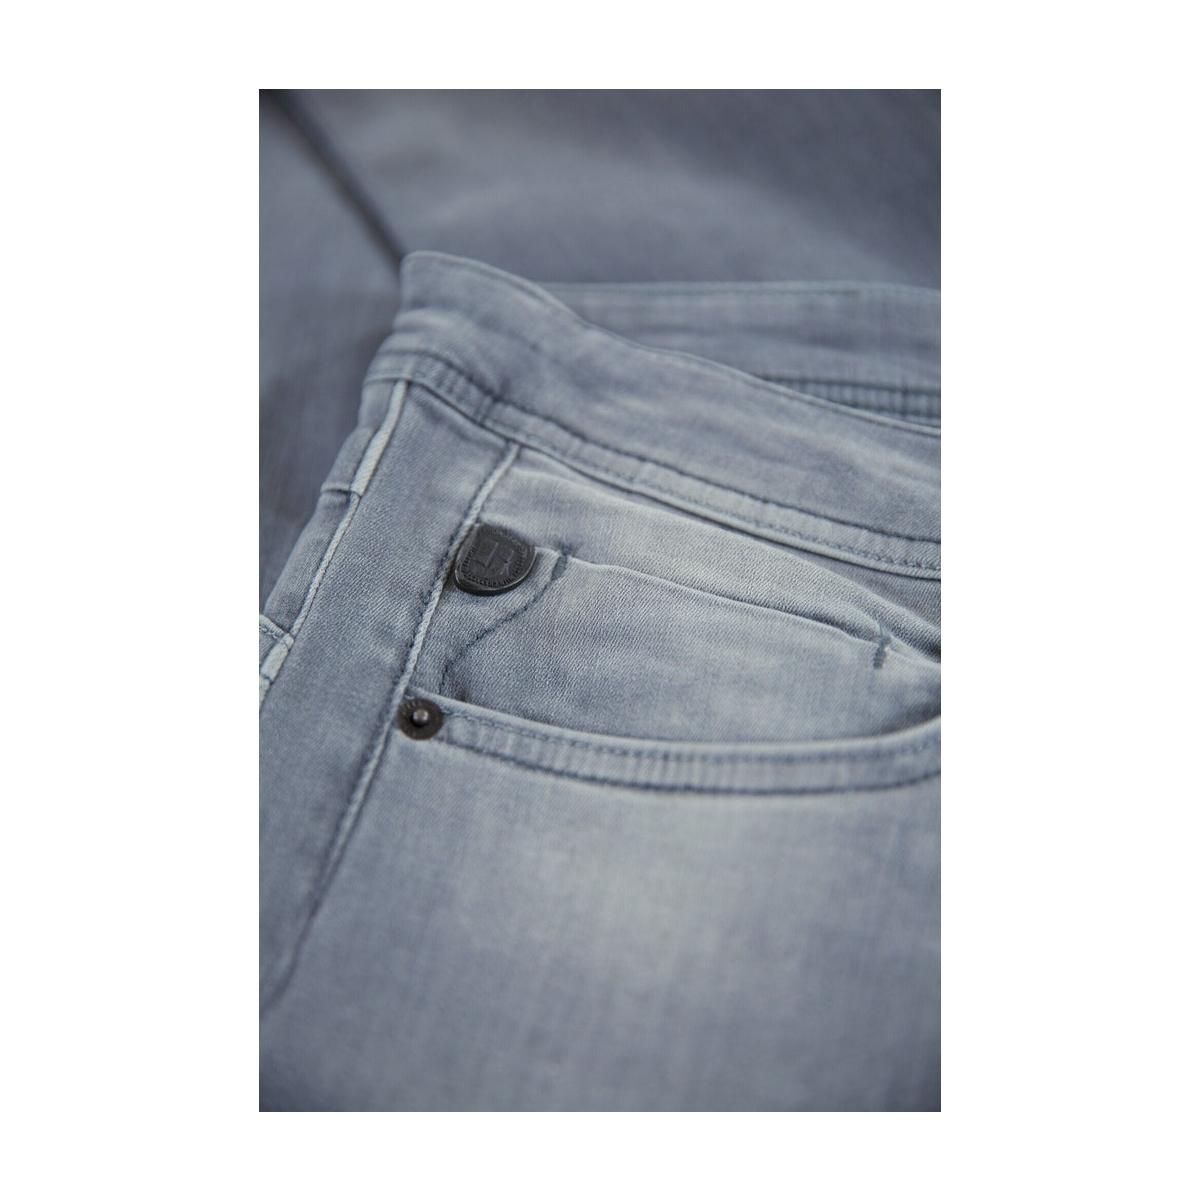 rocko 690 garcia jeans 6610 ultra denim medium used